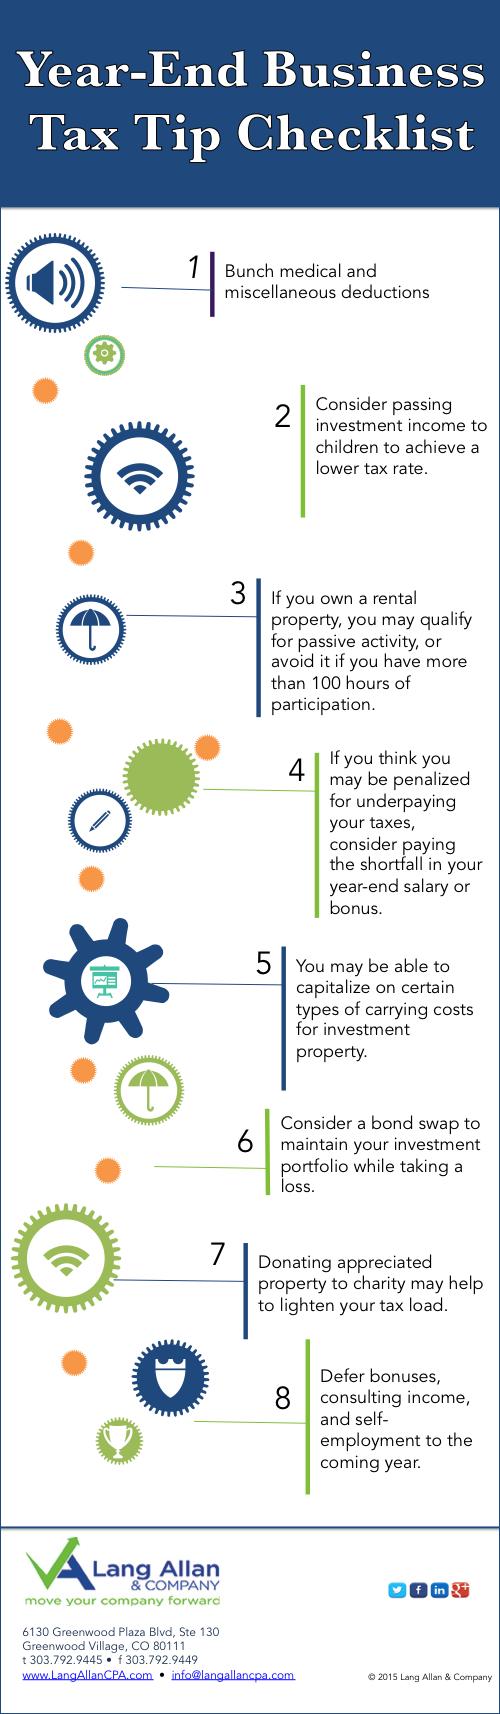 Tax Tips Checklist